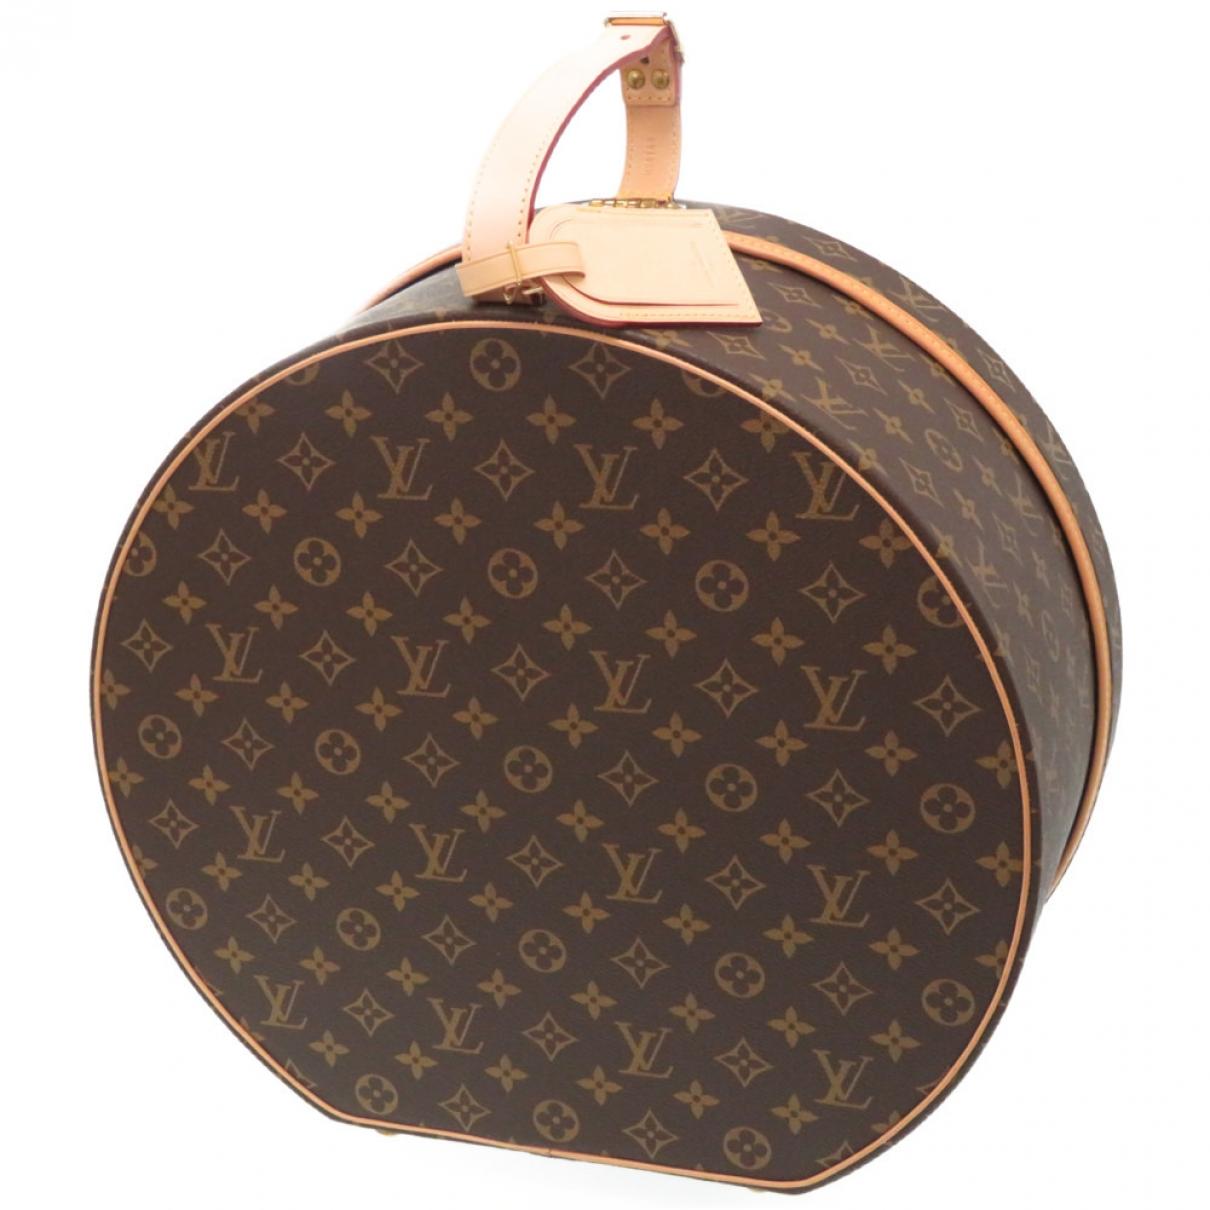 Neceser de Lona Louis Vuitton